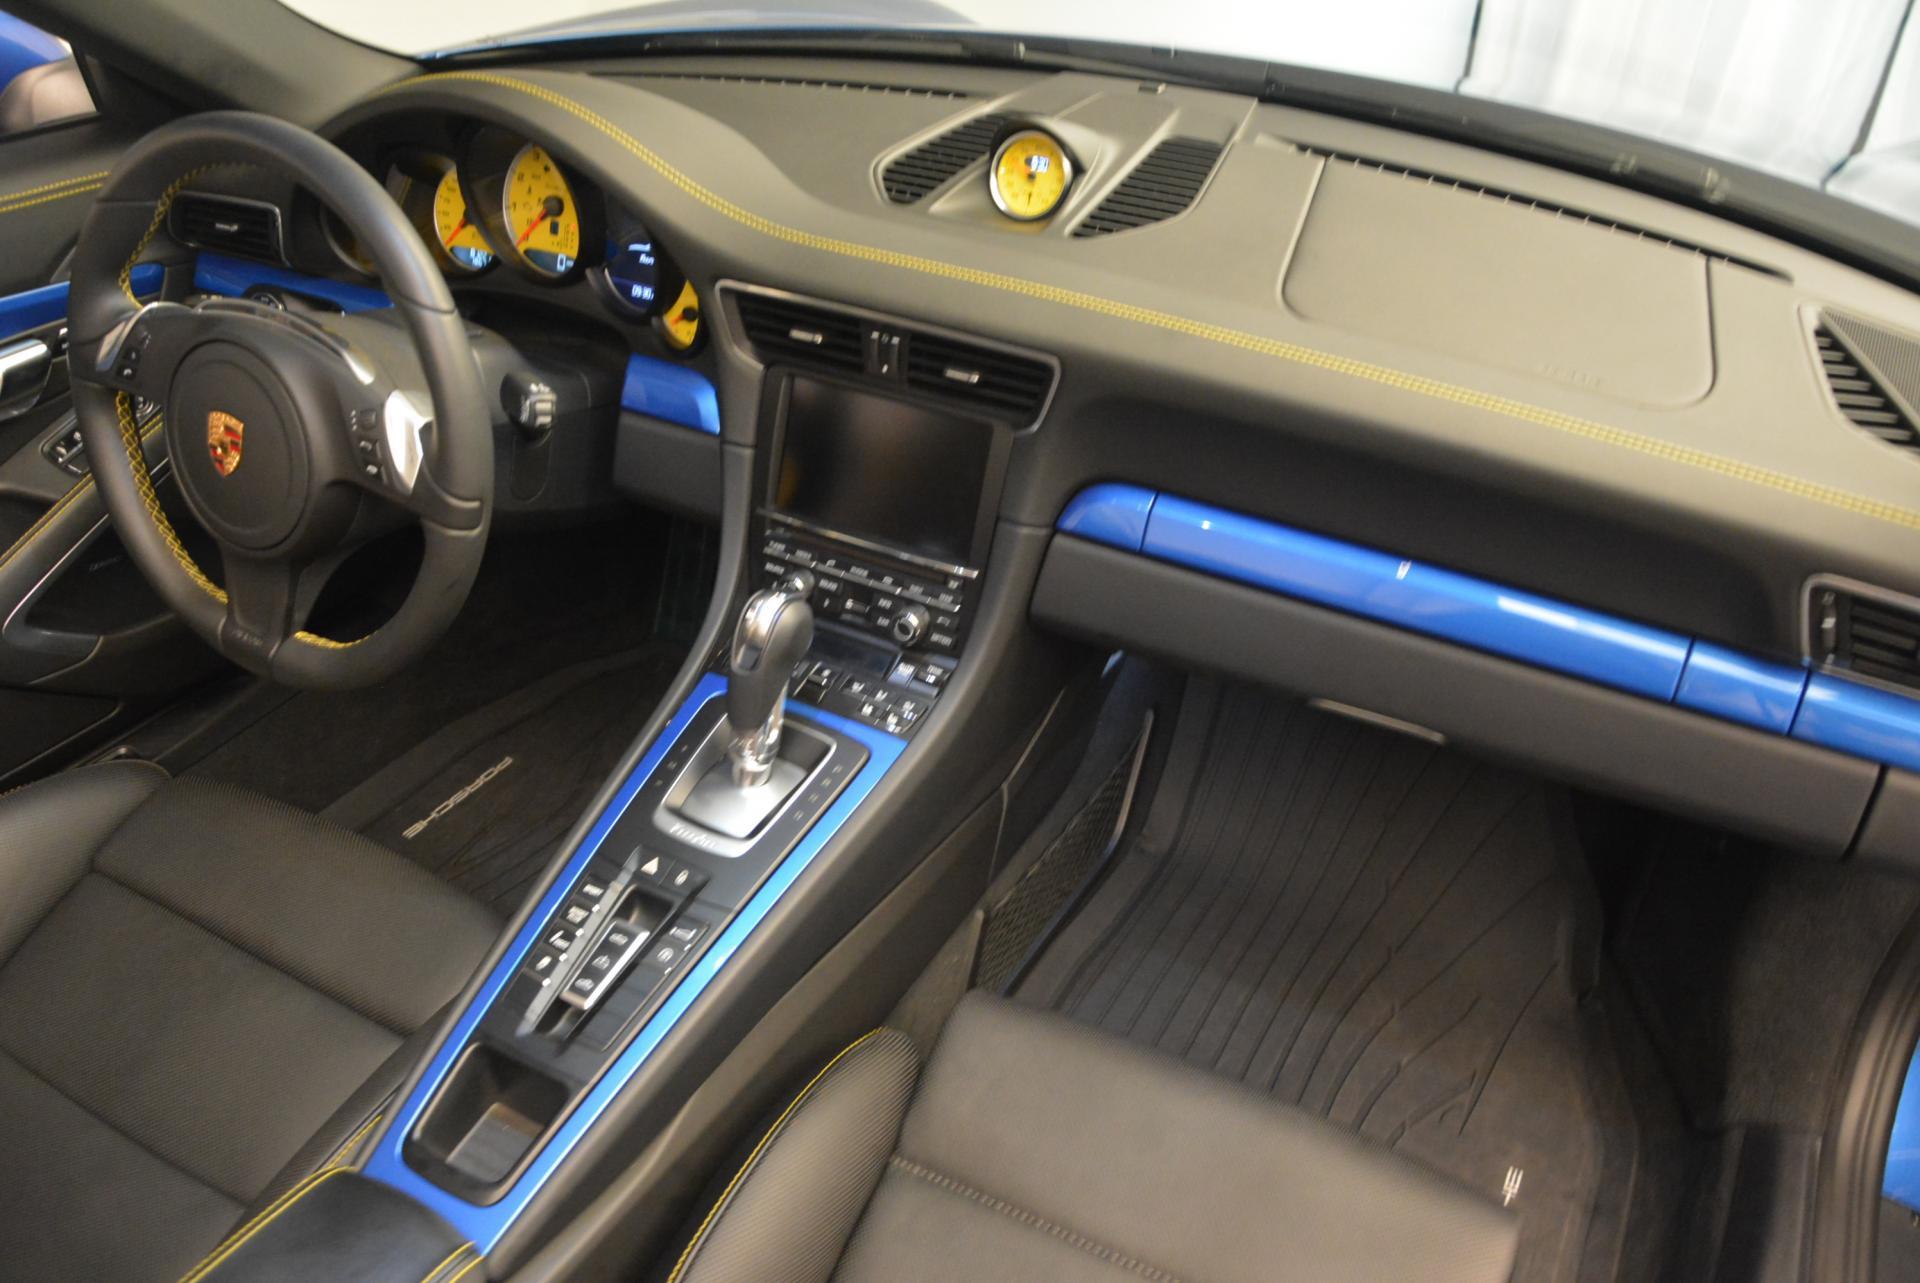 Used 2014 Porsche 911 Turbo S For Sale In Greenwich, CT 105_p24